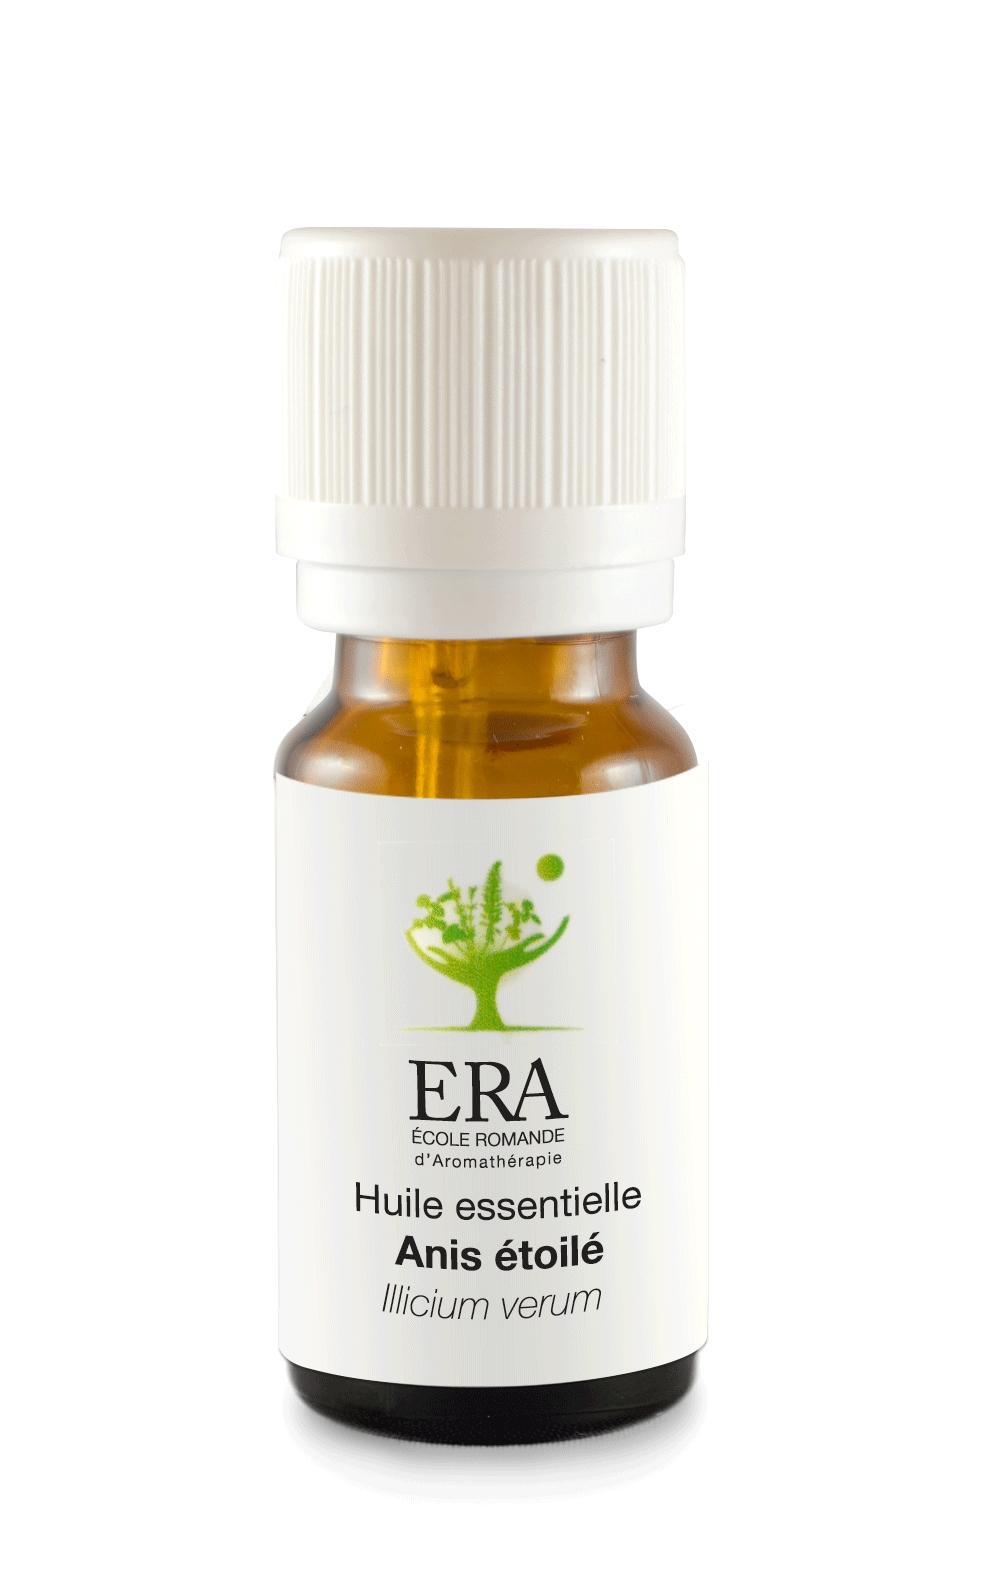 Anis étoilé - Illicium verum - Shisandracées